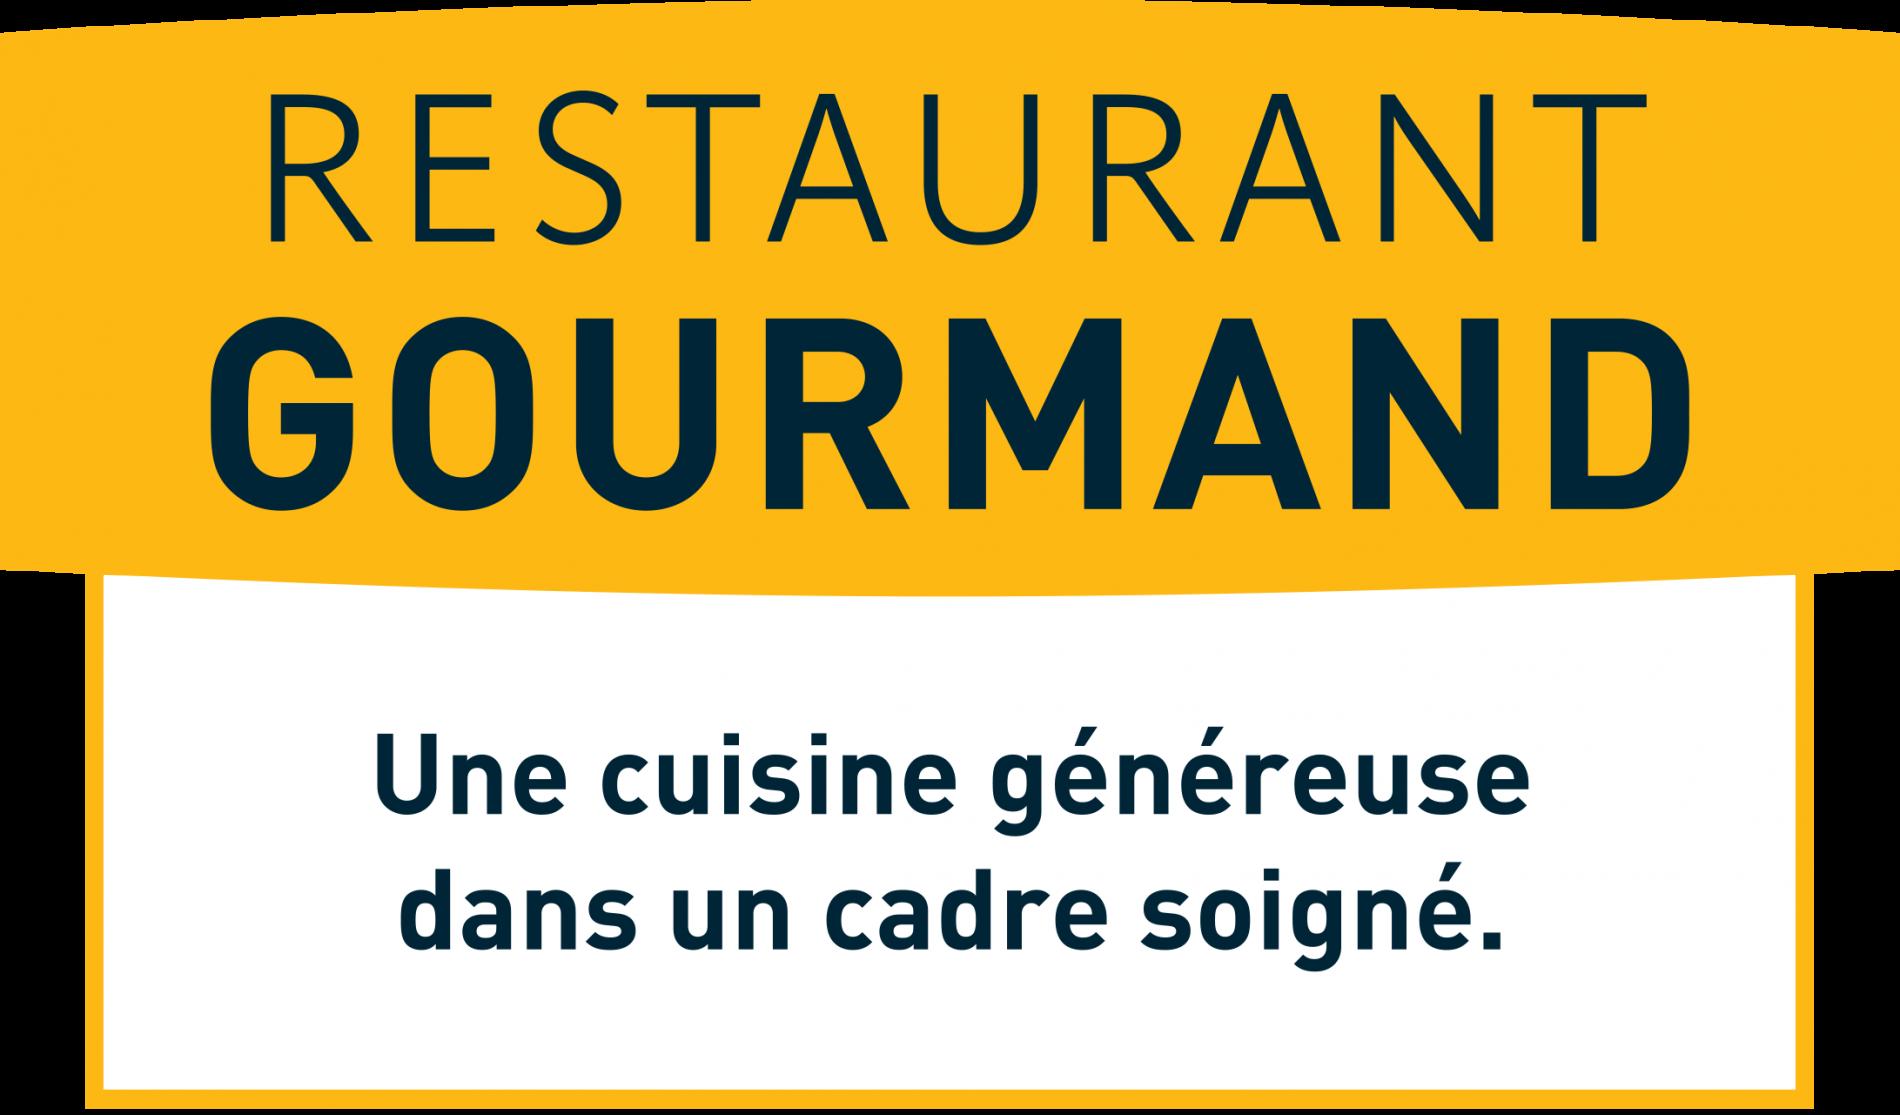 Restaurant Logis Gourmand La Benoite